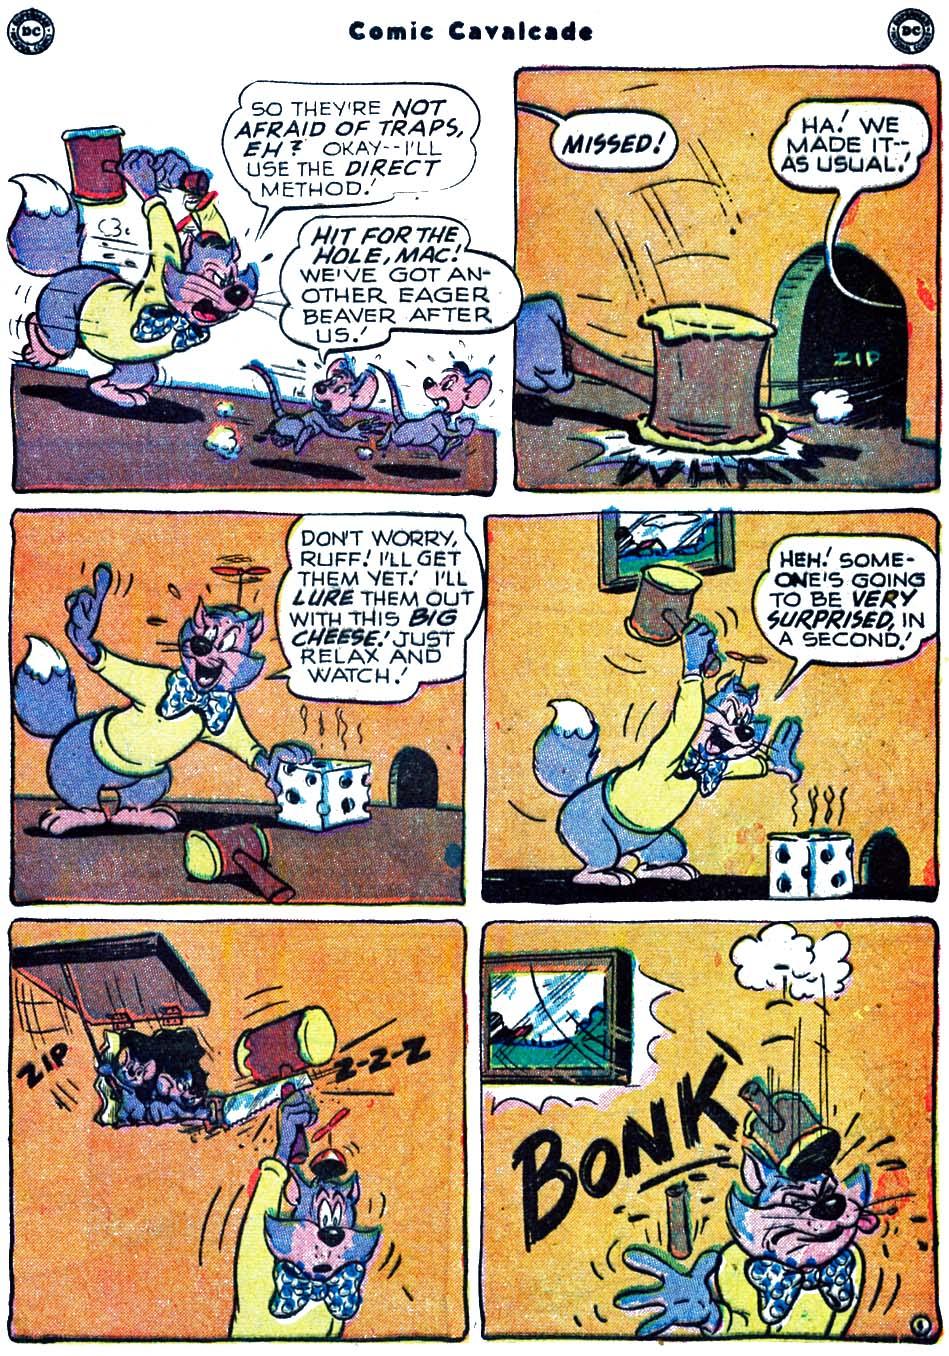 Comic Cavalcade issue 40 - Page 55